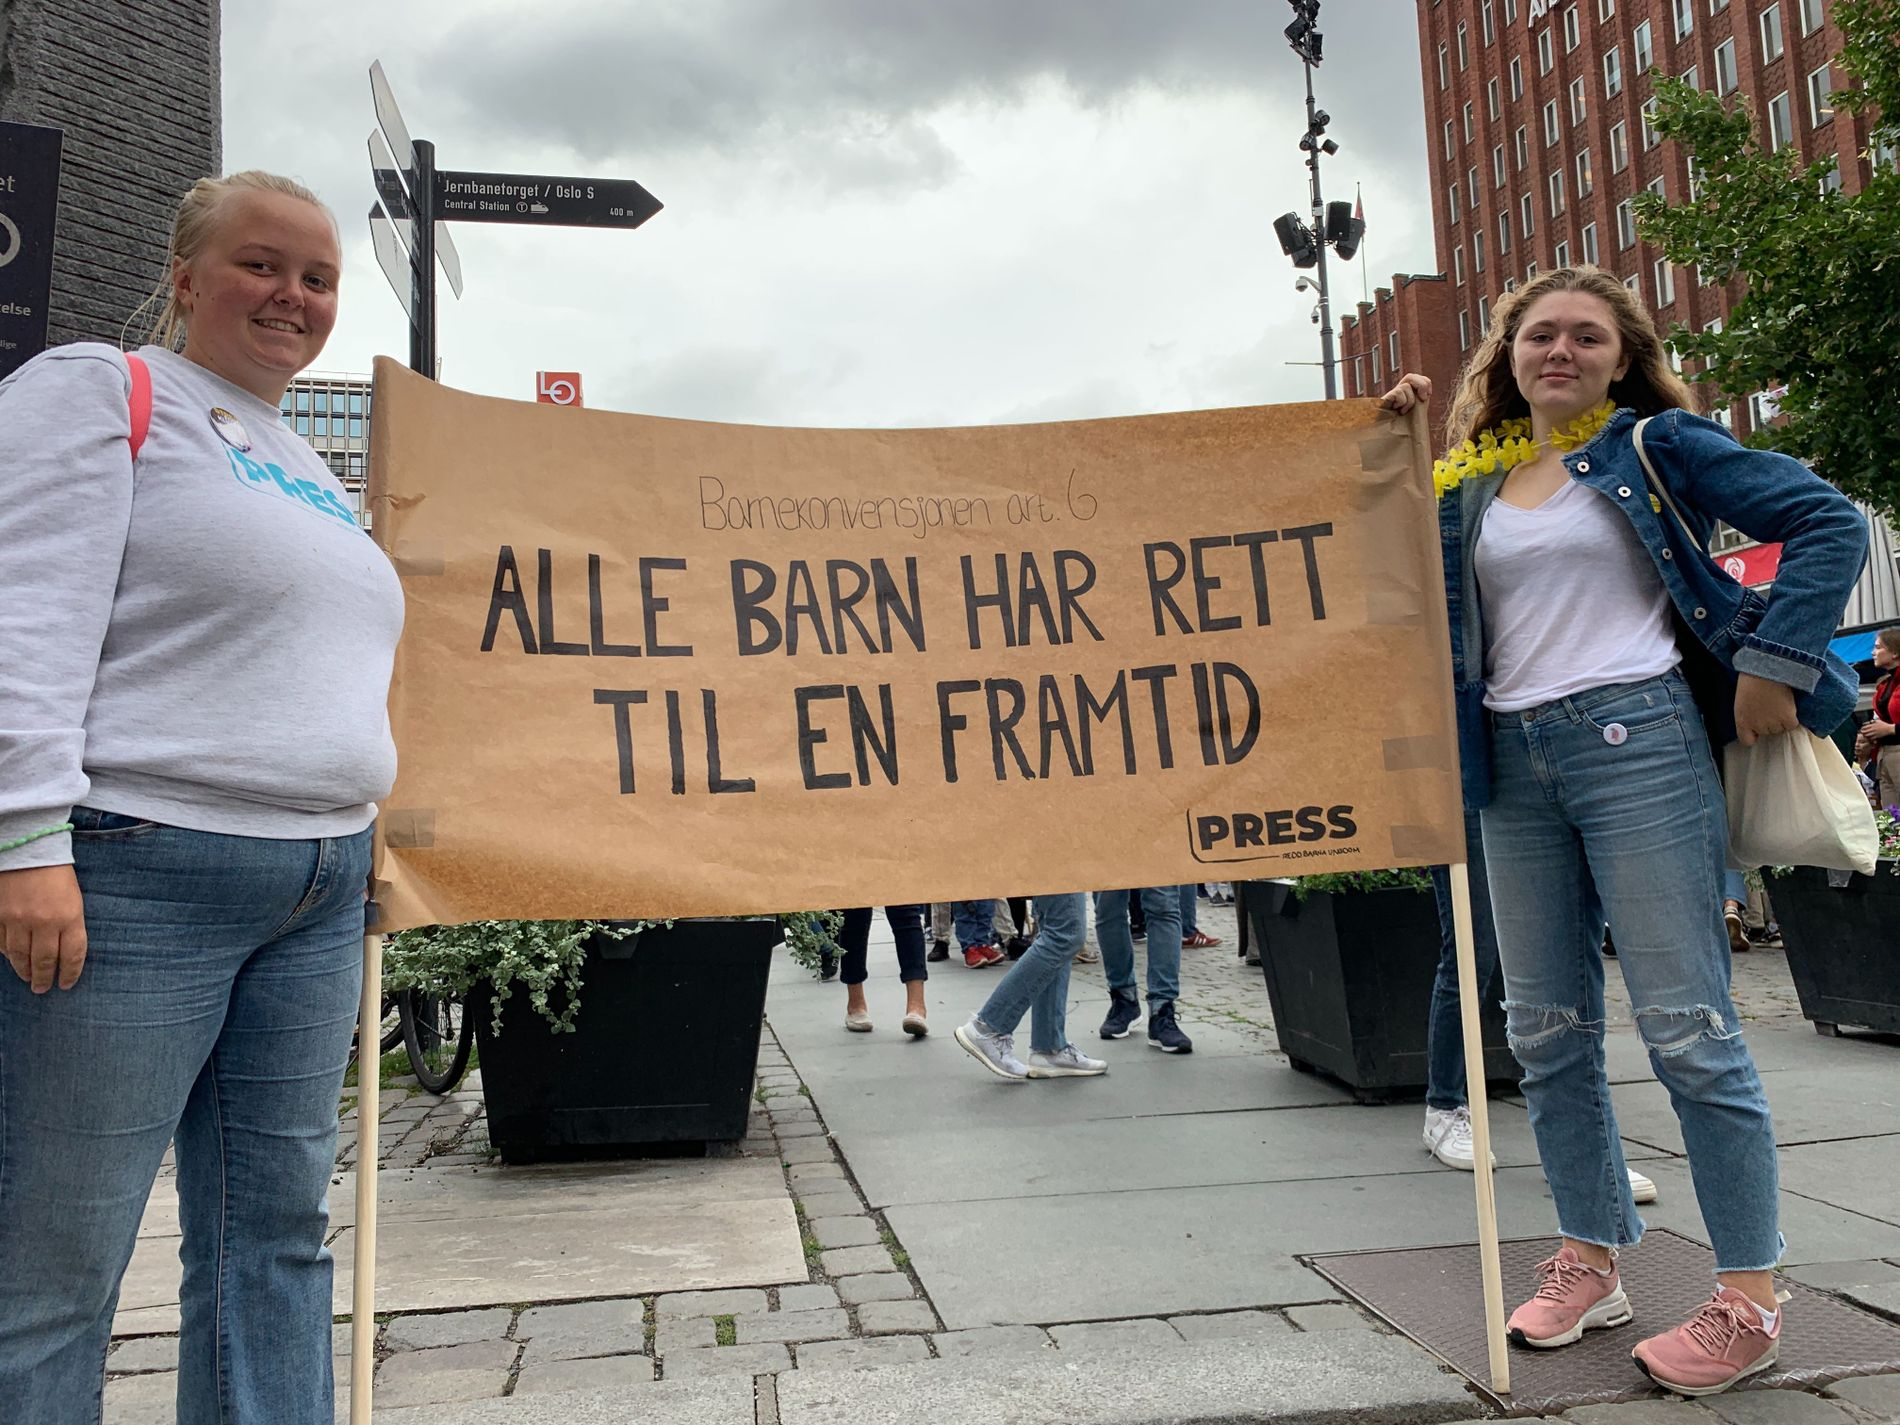 F.v. Anna Hellebust og Maja Tørstad streiket for klimaet fredag.